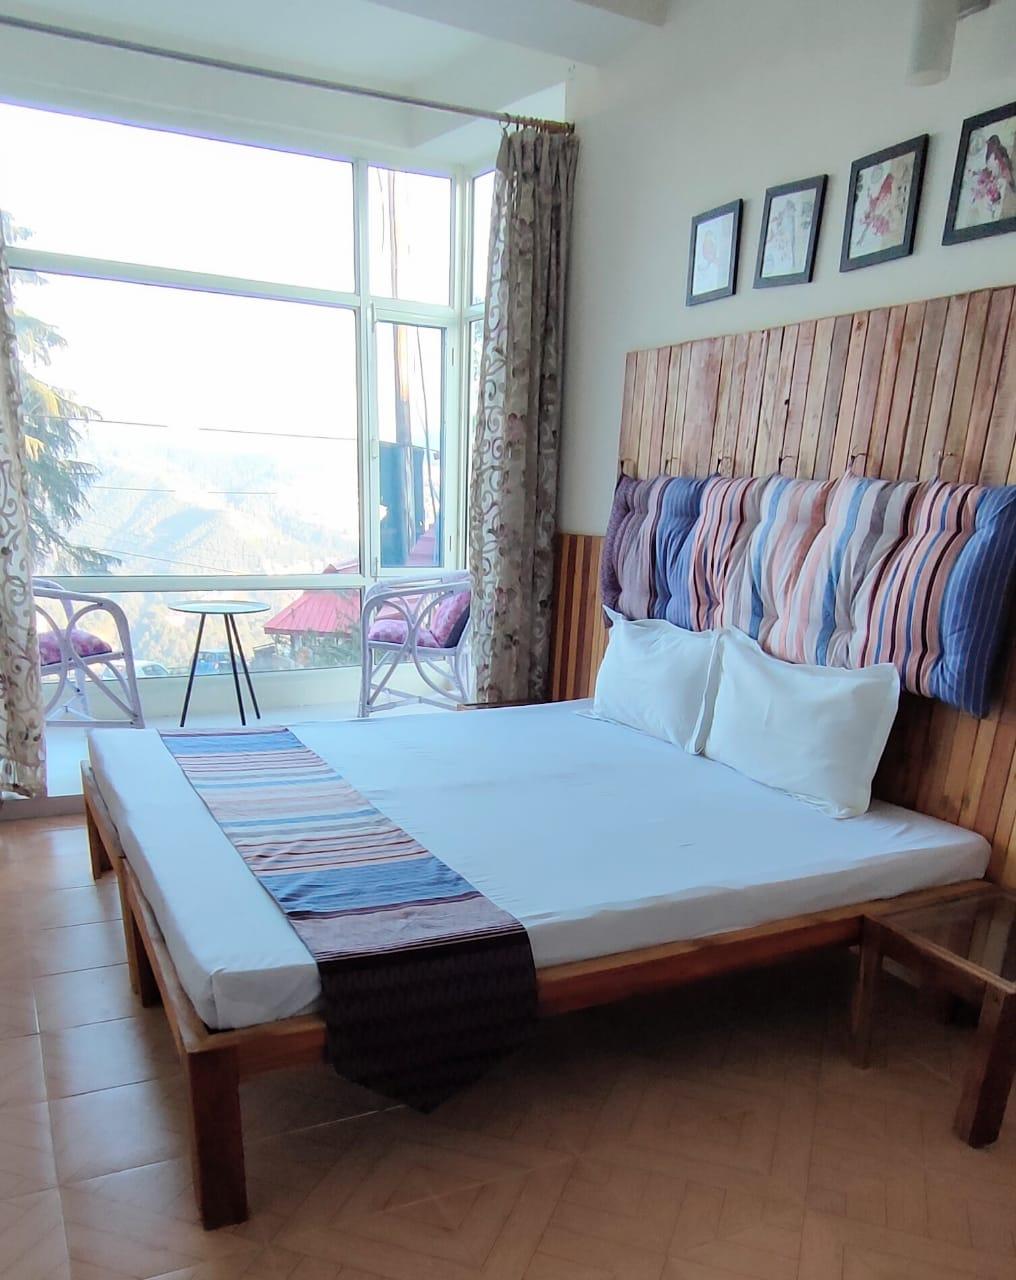 1130-apartment-in-shimla 2bhk-1